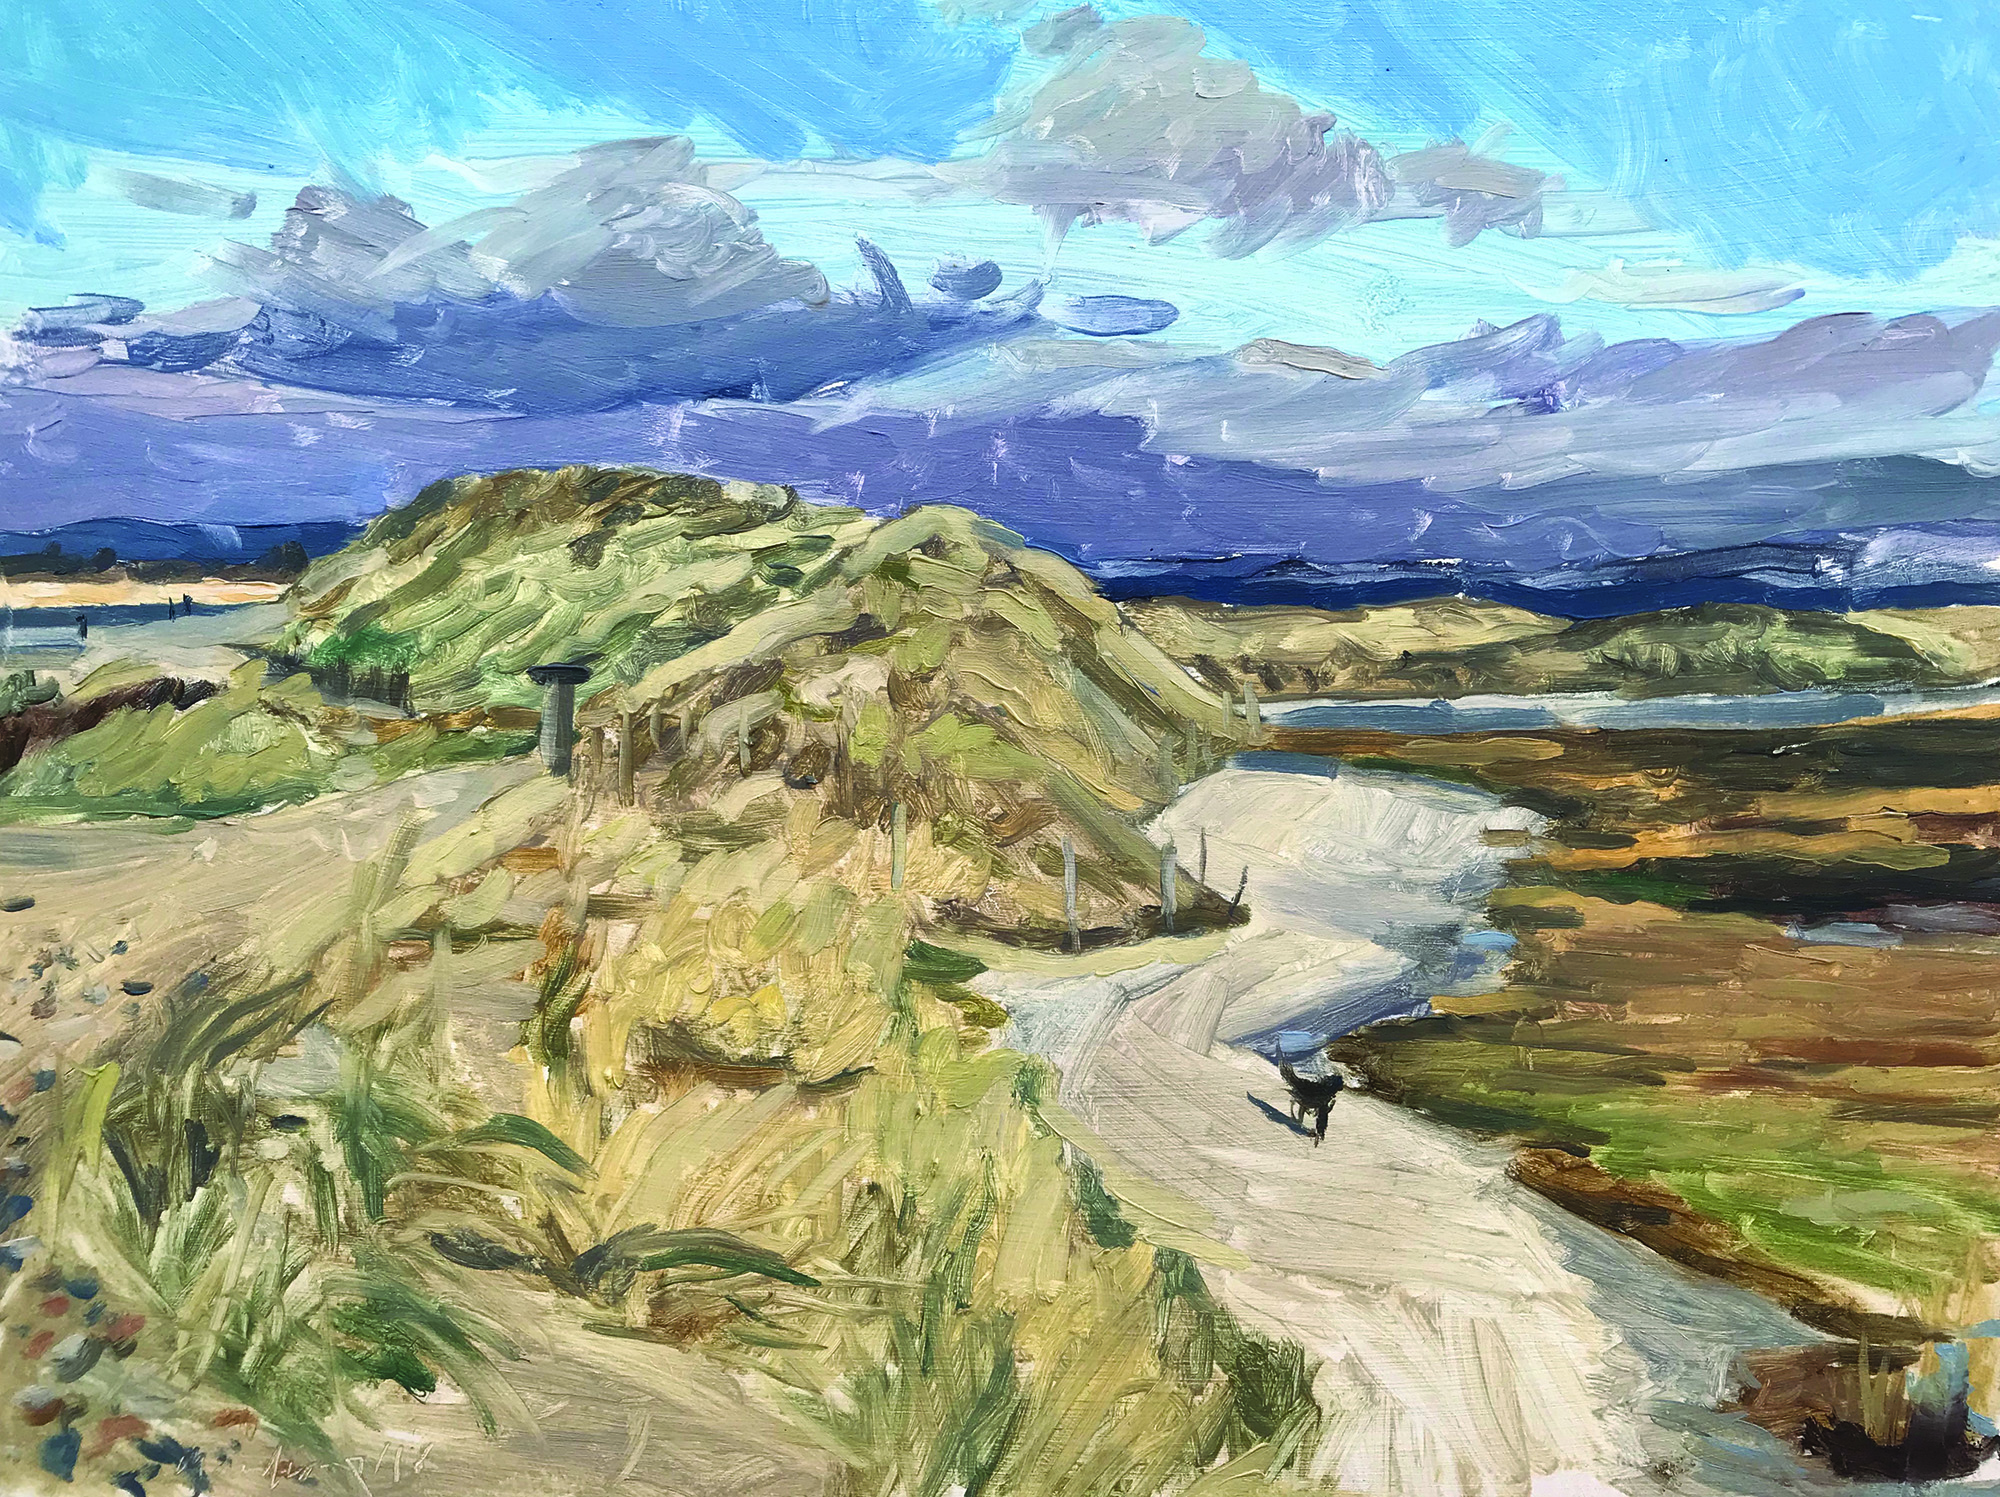 Sarah Manolescue, Dog on the path, East Head, Oil on panel, 30.5 cm x 40.5 cm x 0.3 cm,  http://www.sarahmanolescue.co.uk